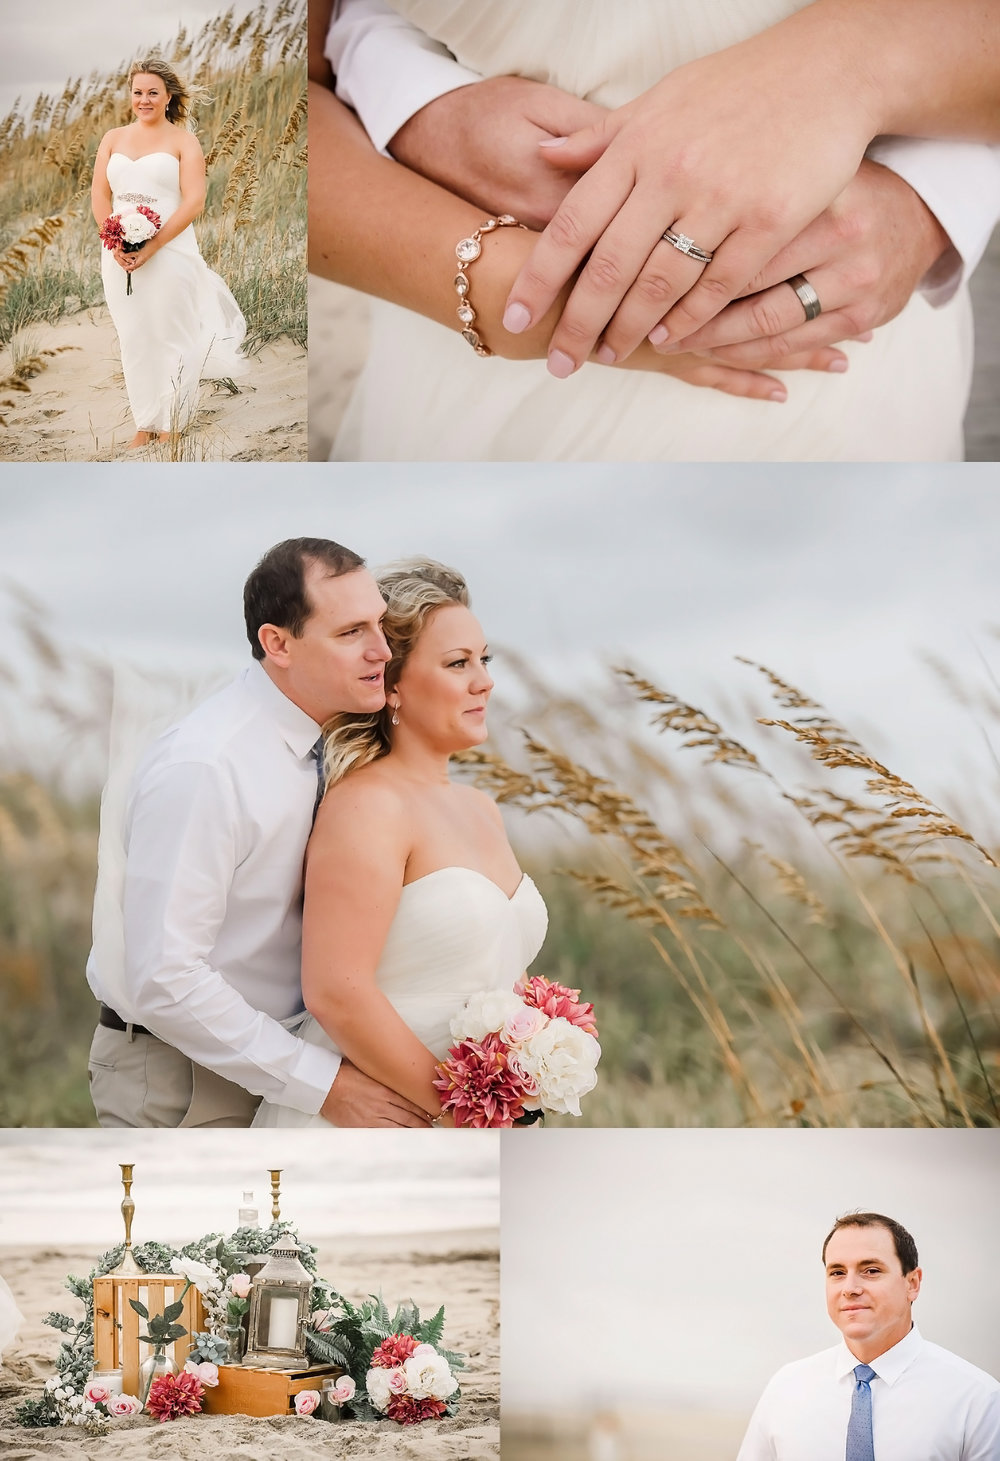 virginia-beach-norfolk-sandbridge-suffolk-chesapeake-wedding-and-elopement-photographers-melissa-bliss-photography-beach-wedding